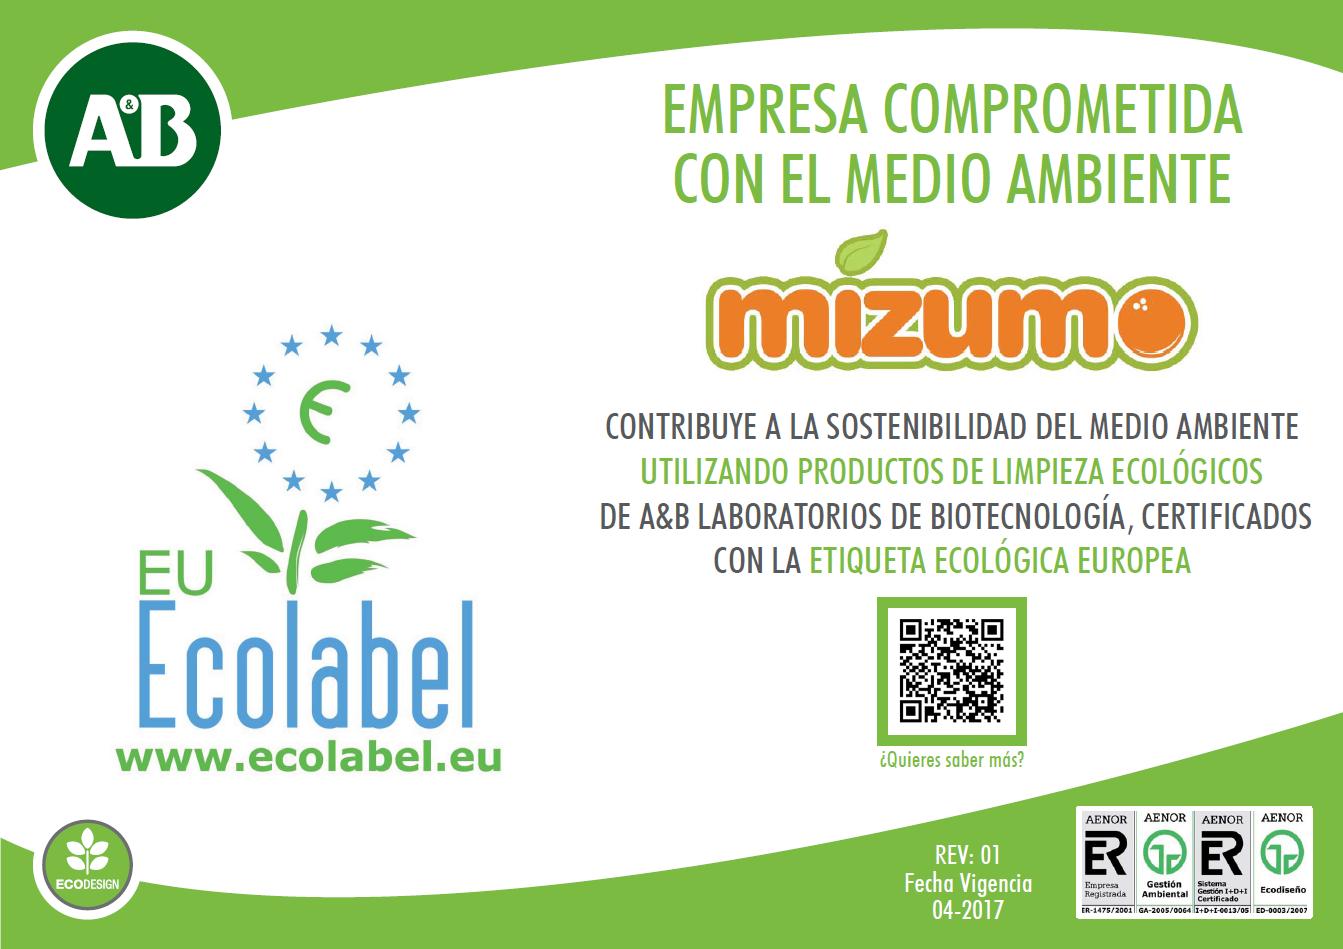 Eco-label Español